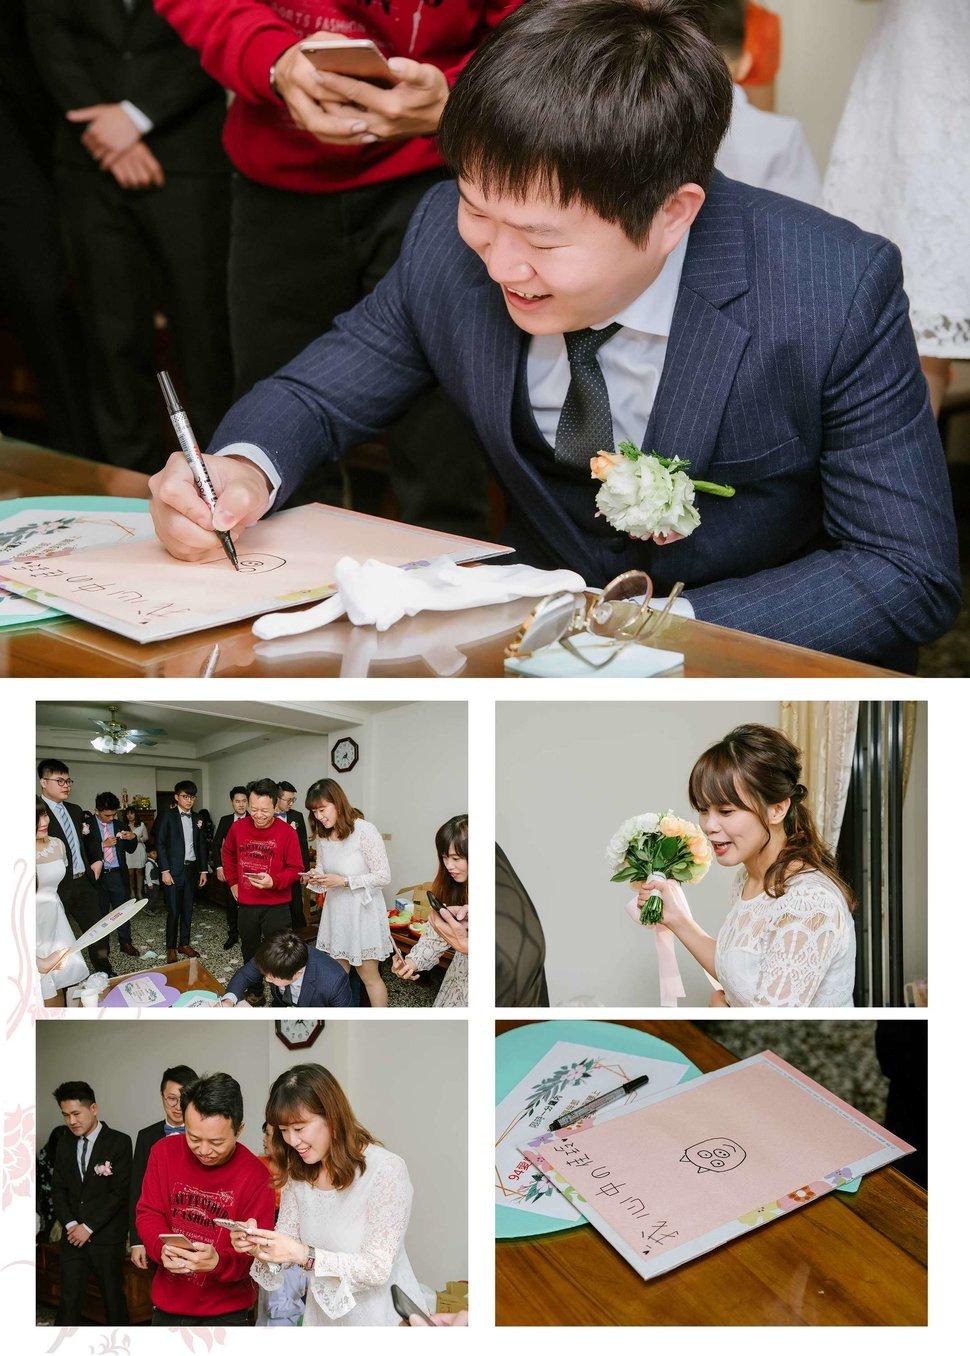 08 - D&L 婚禮事務 · 婚禮婚紗攝影《結婚吧》